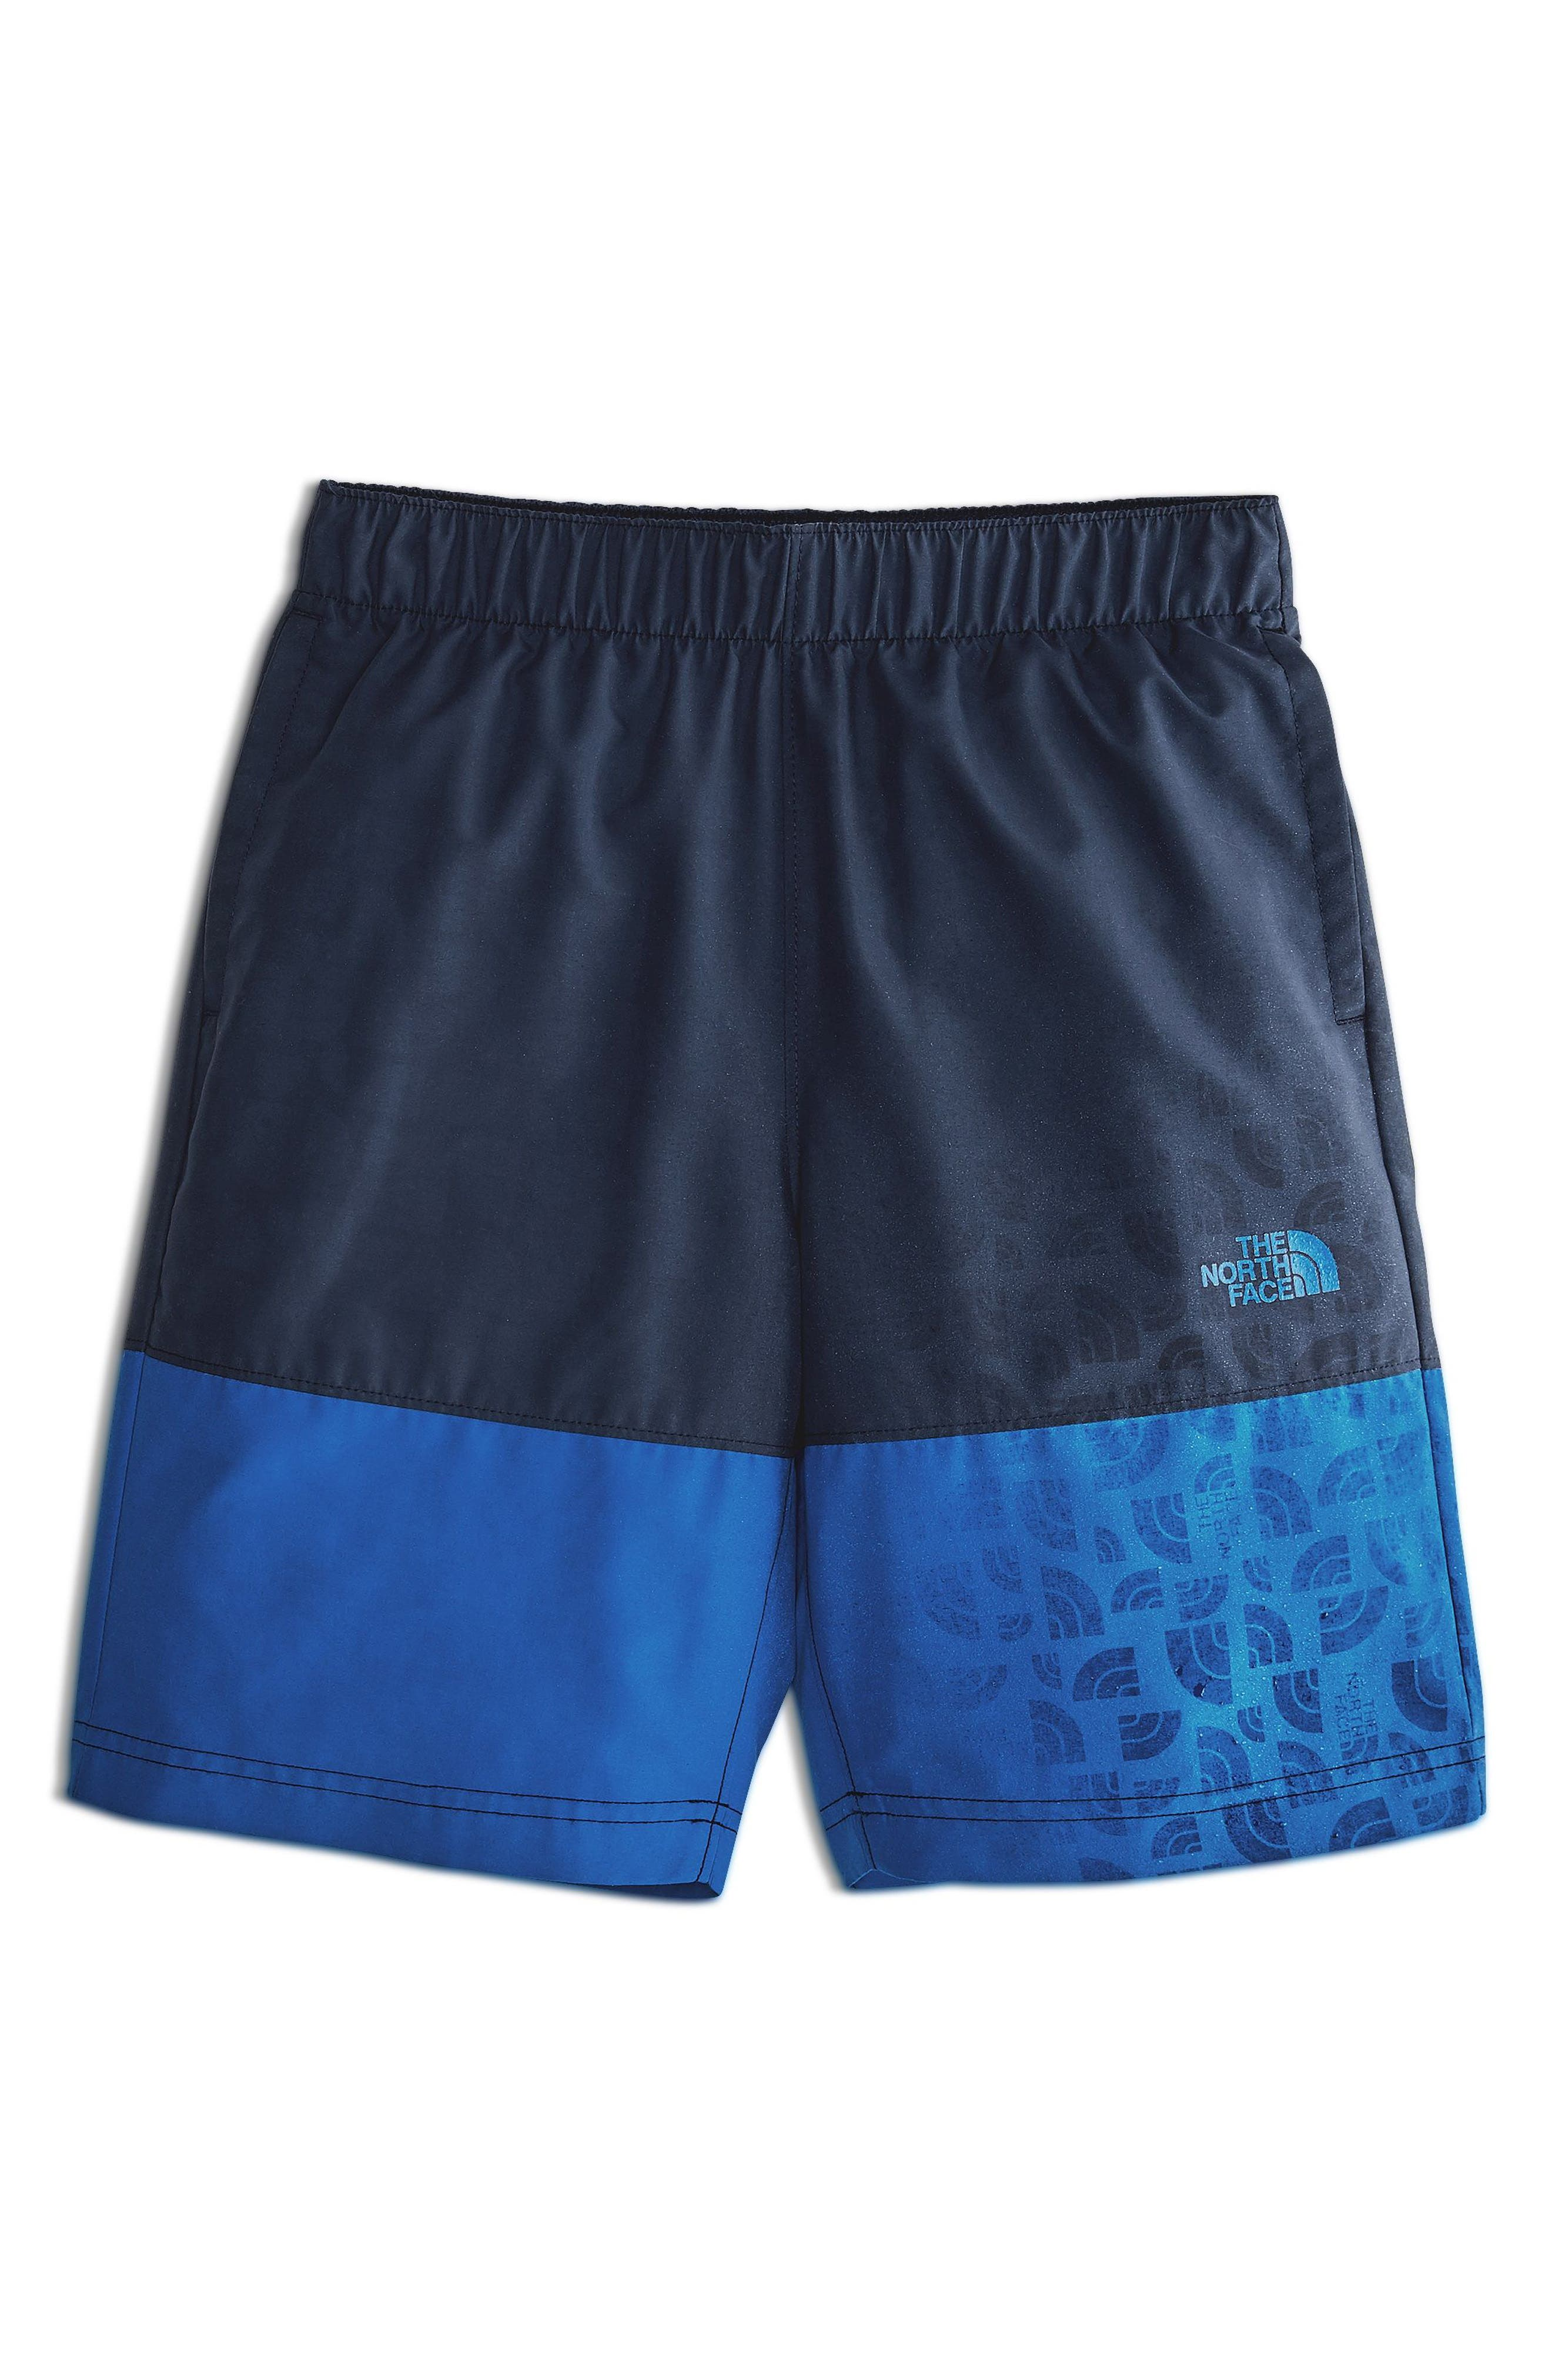 Swim Shorts,                         Main,                         color, 401